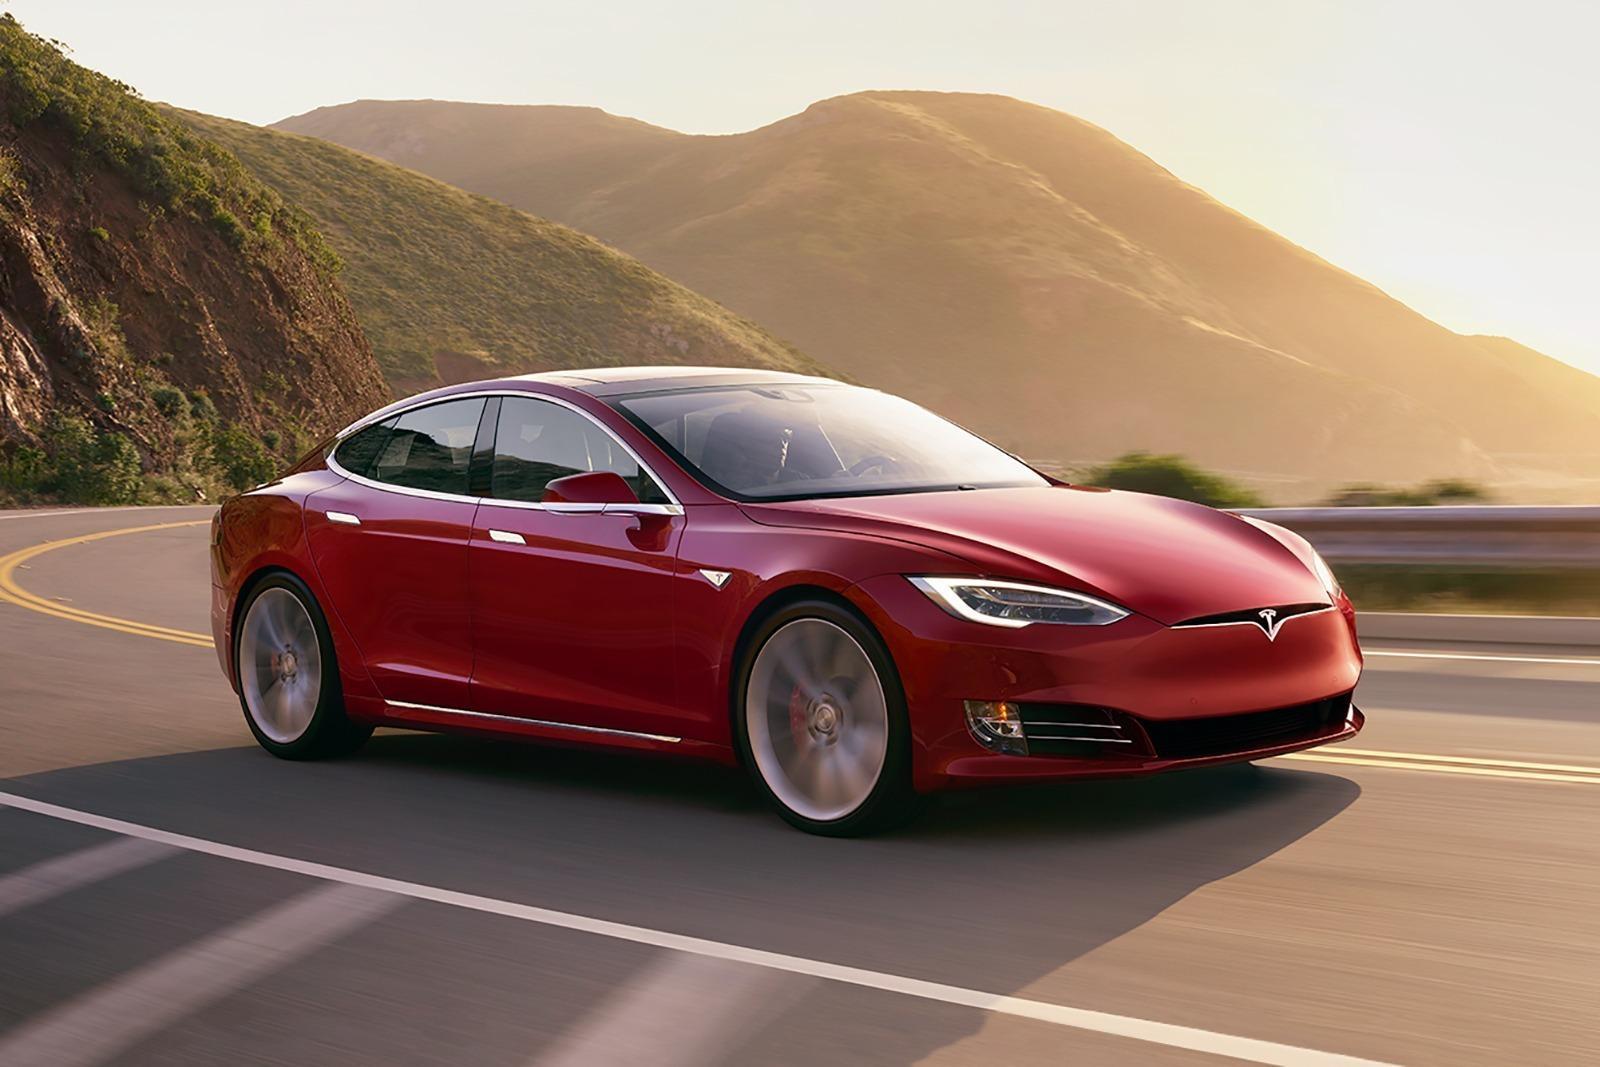 2018 Tesla Model S P100d Review Trims Specs And Price Carbuzz